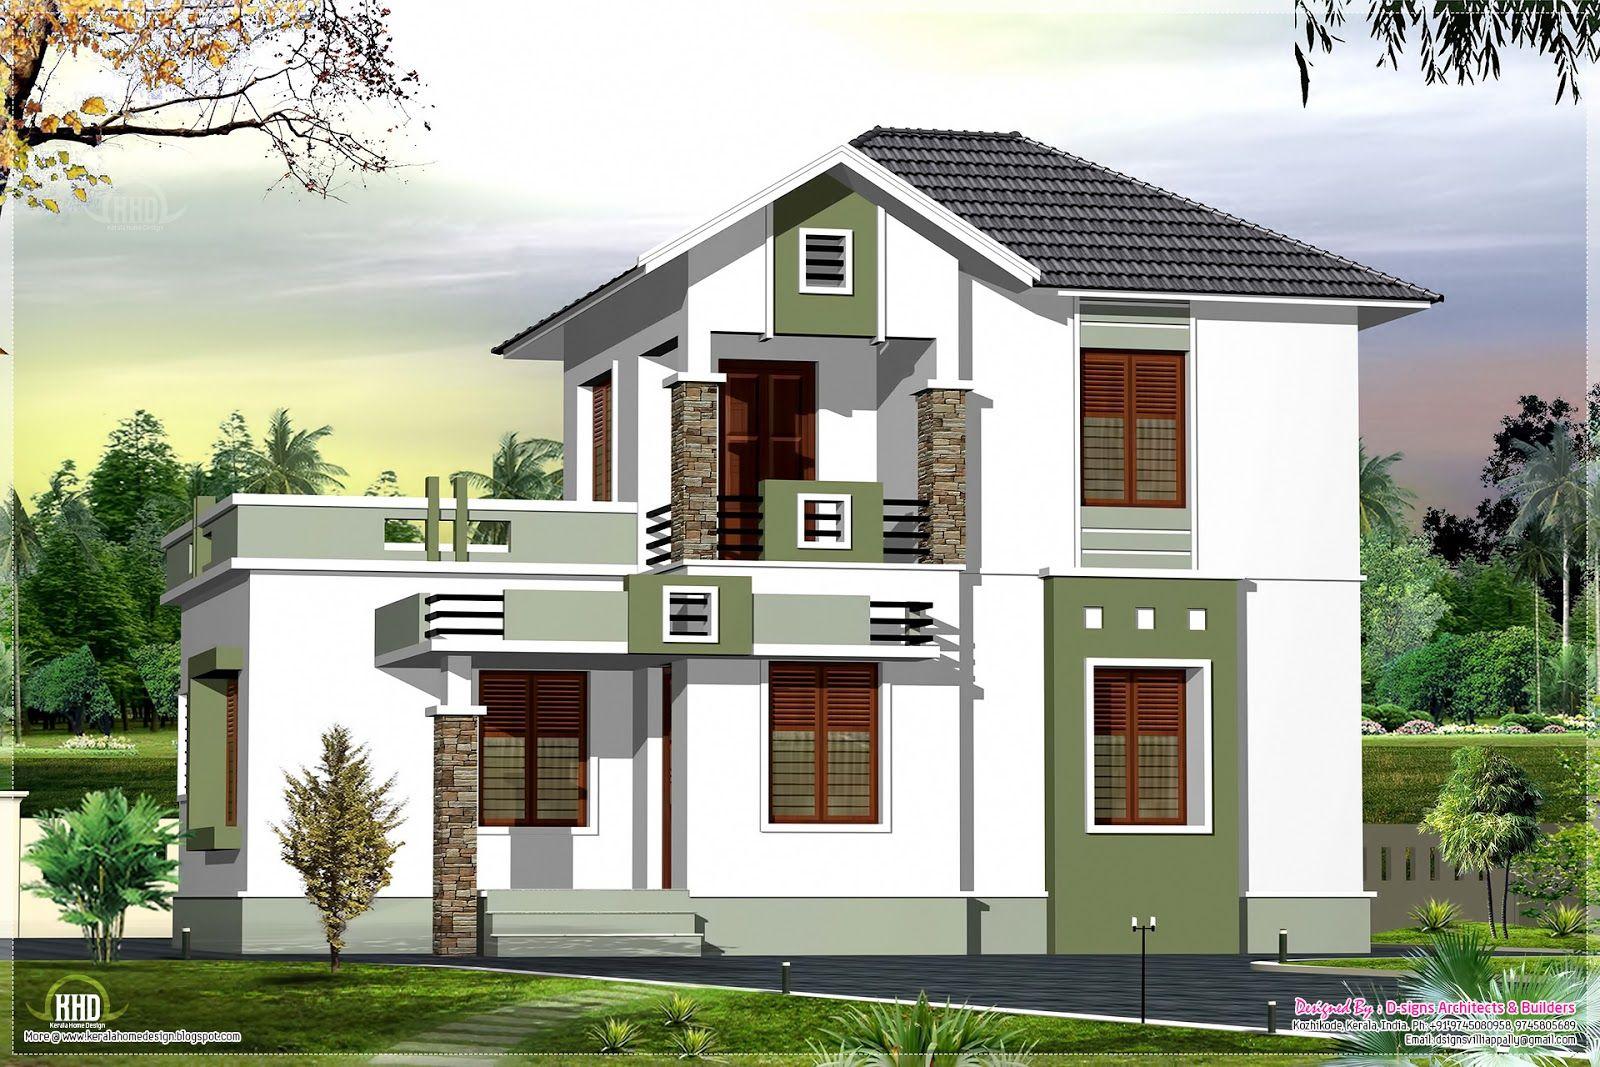 Small double floor home design sq feet house design plans kerala style single floor house plan